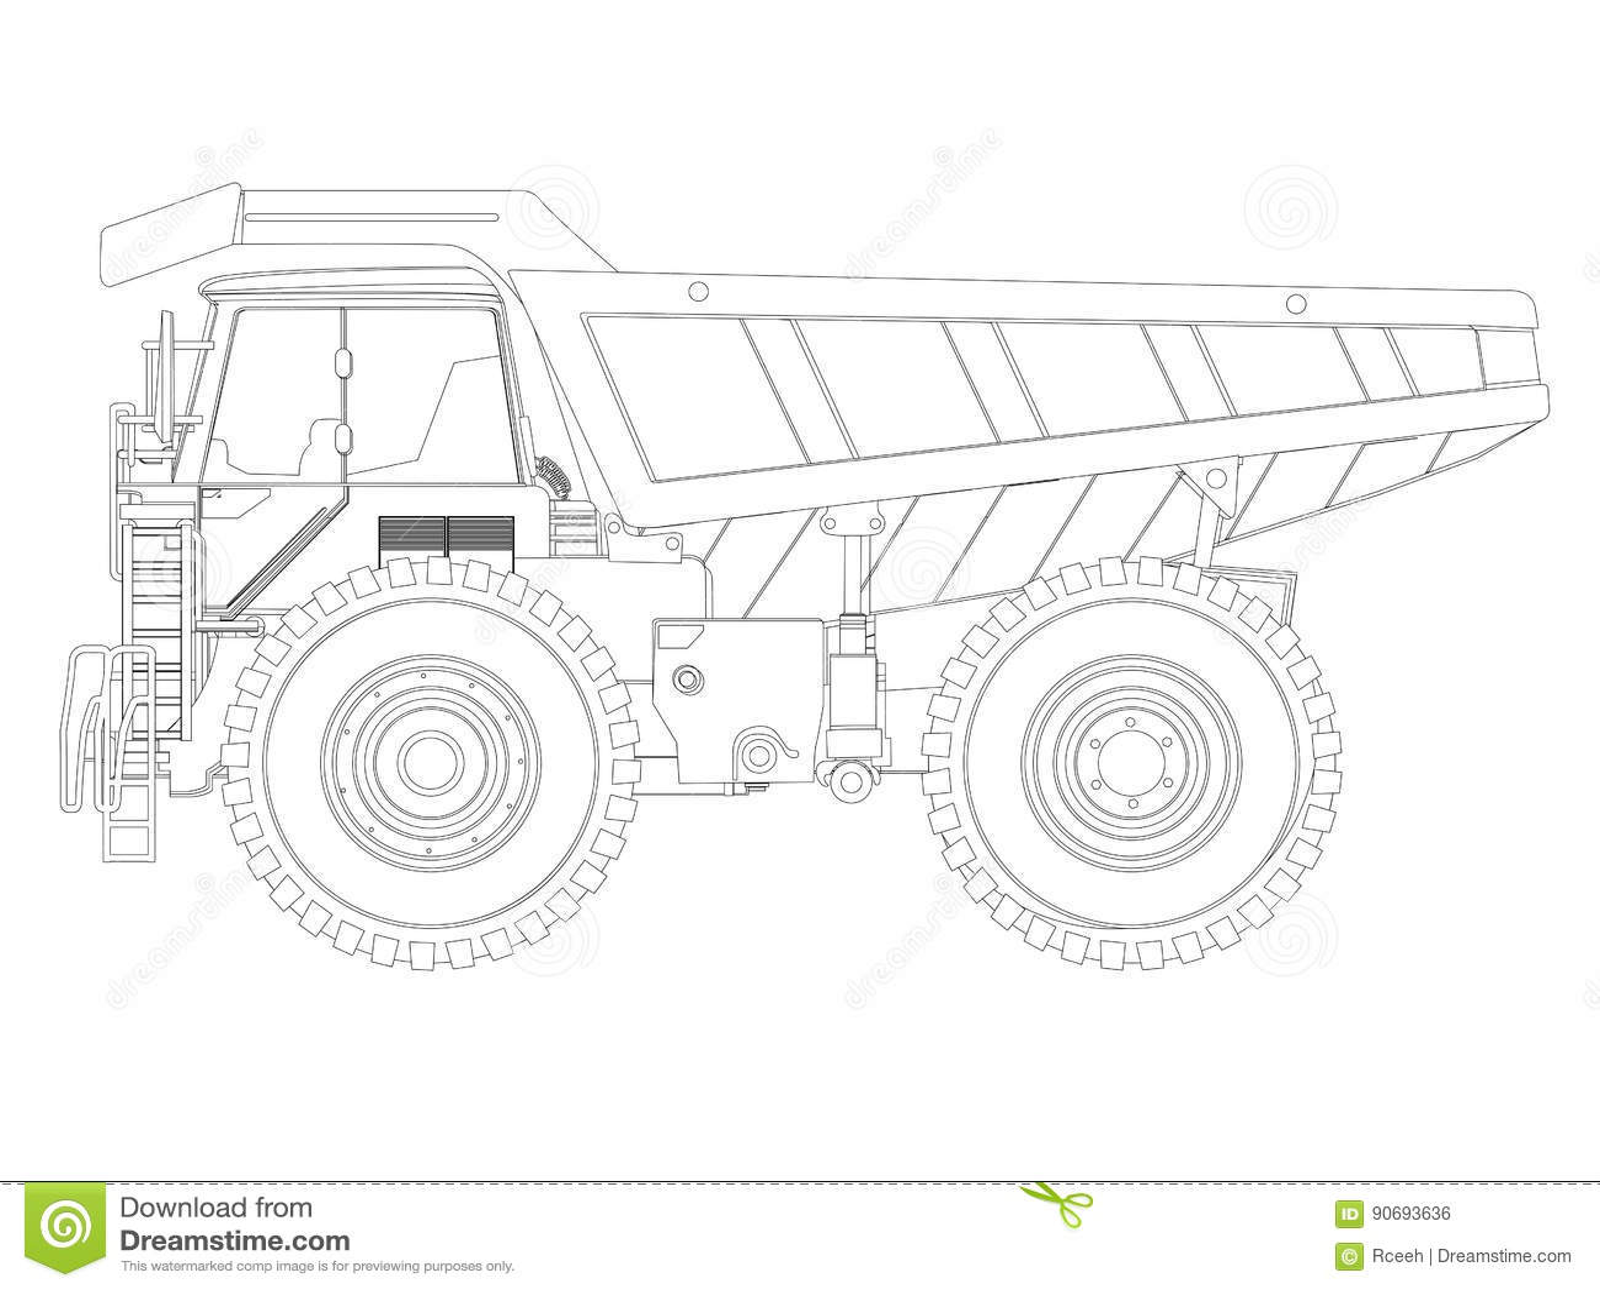 Dump Truck Sketch Stock Vector Illustration Of